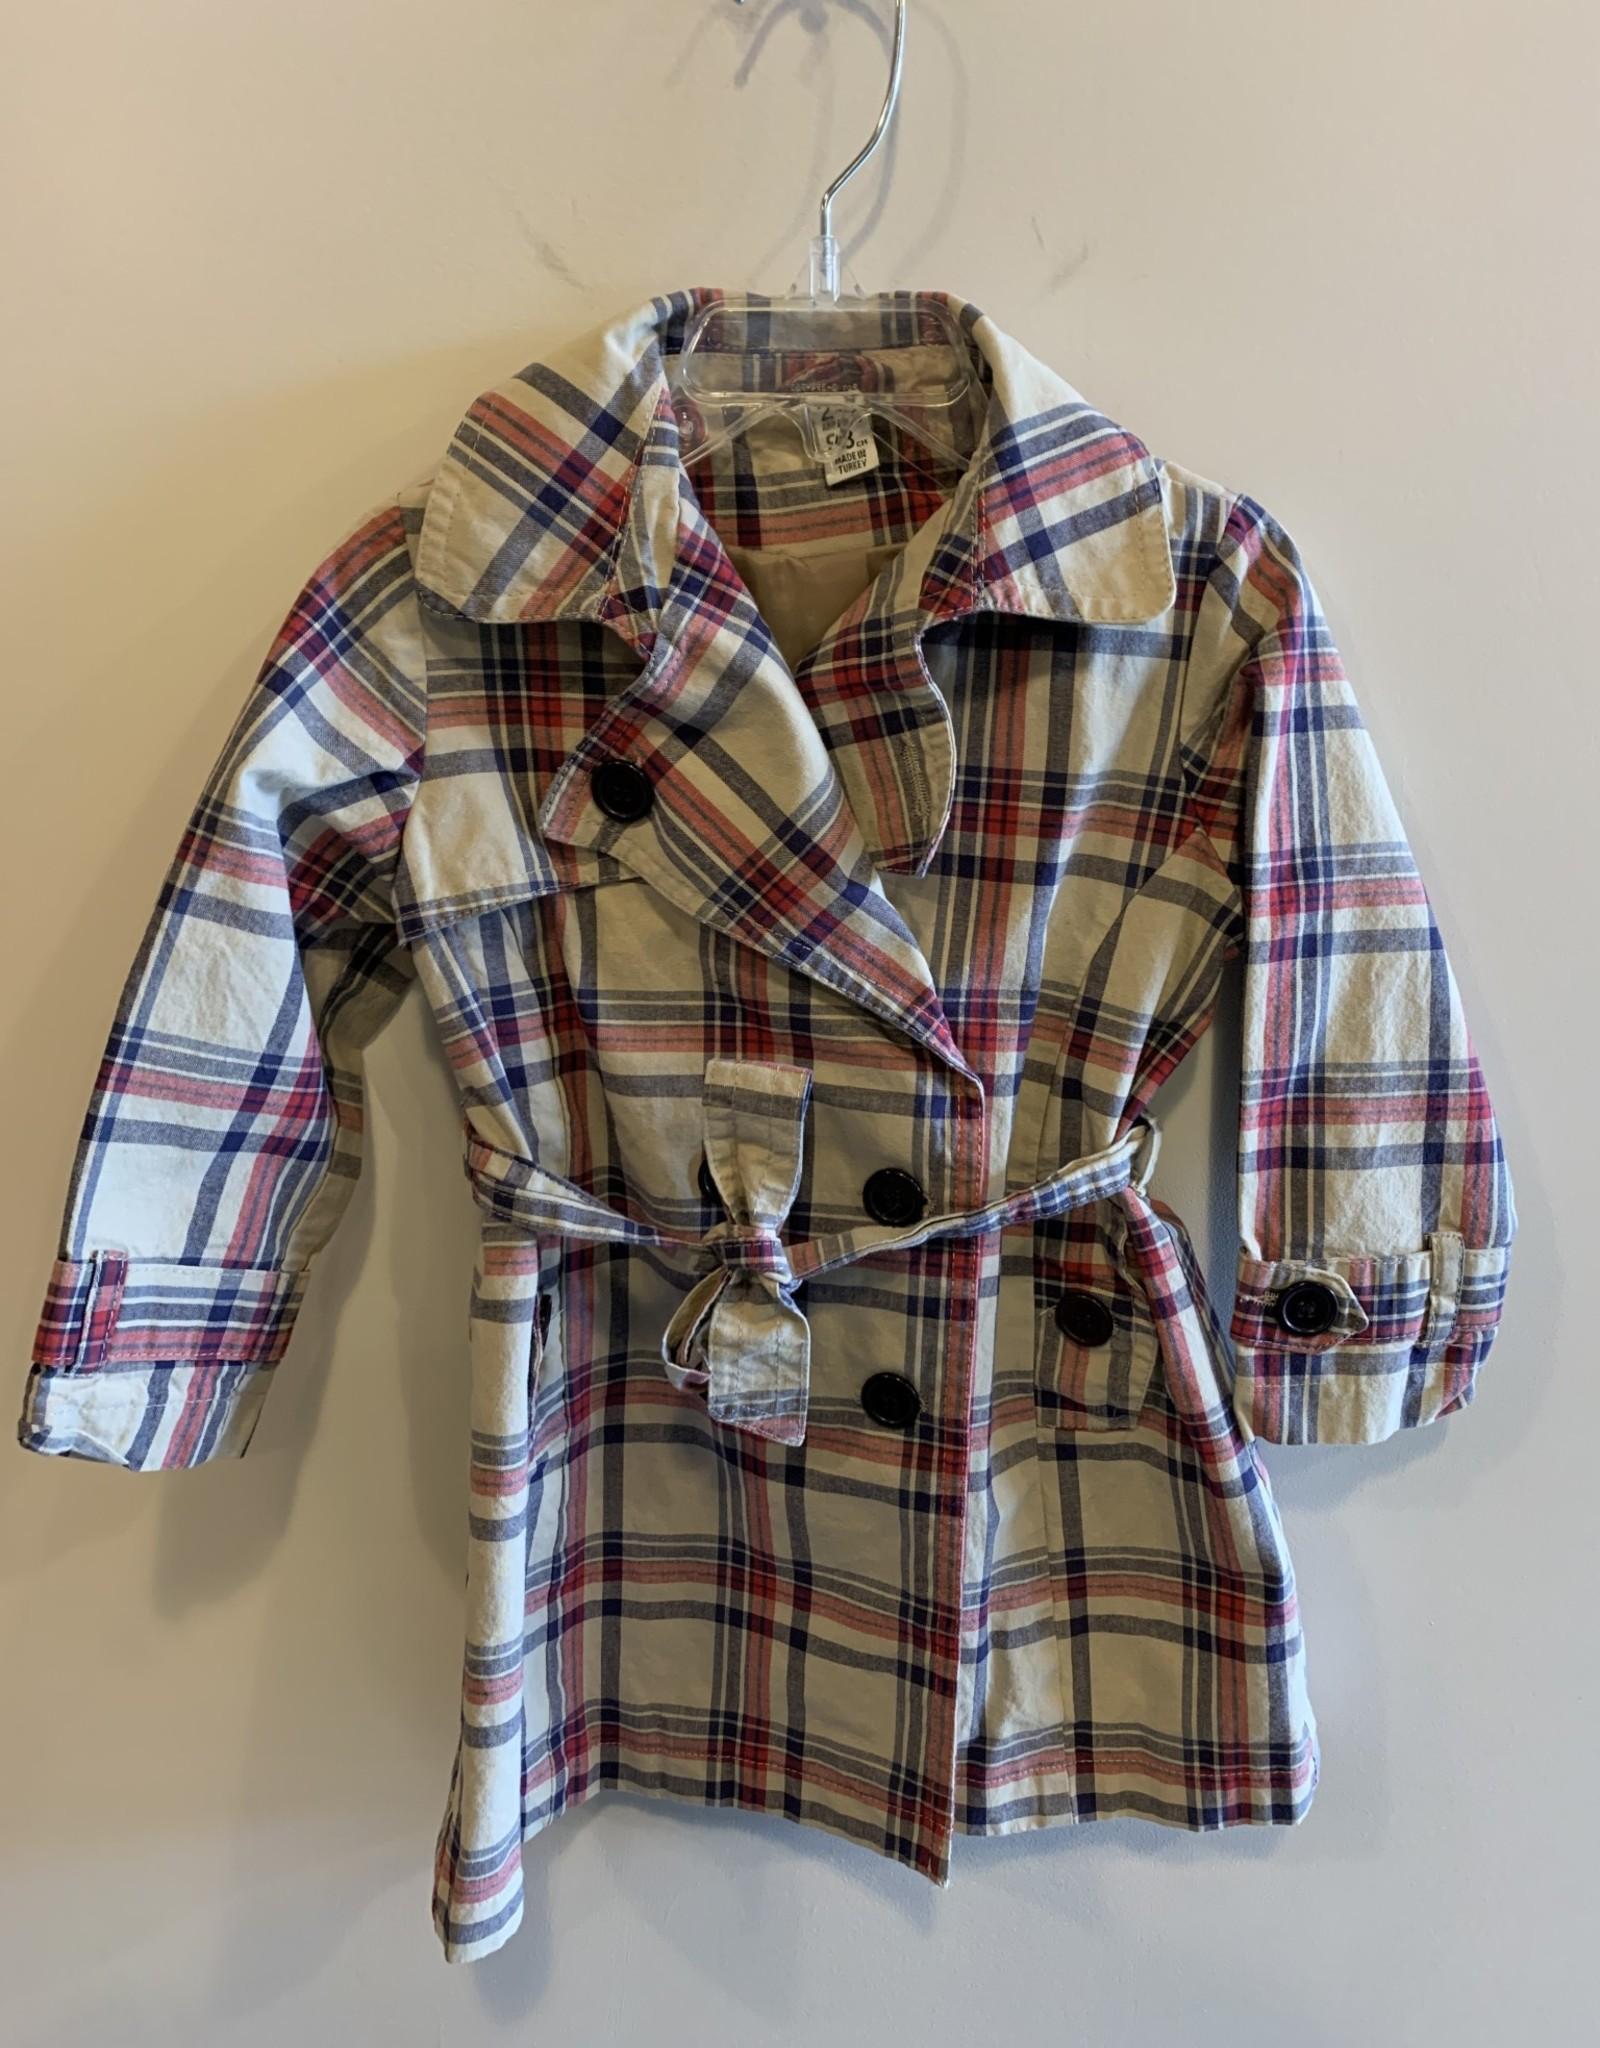 ZARA Girls/2T/Zara/Jacket